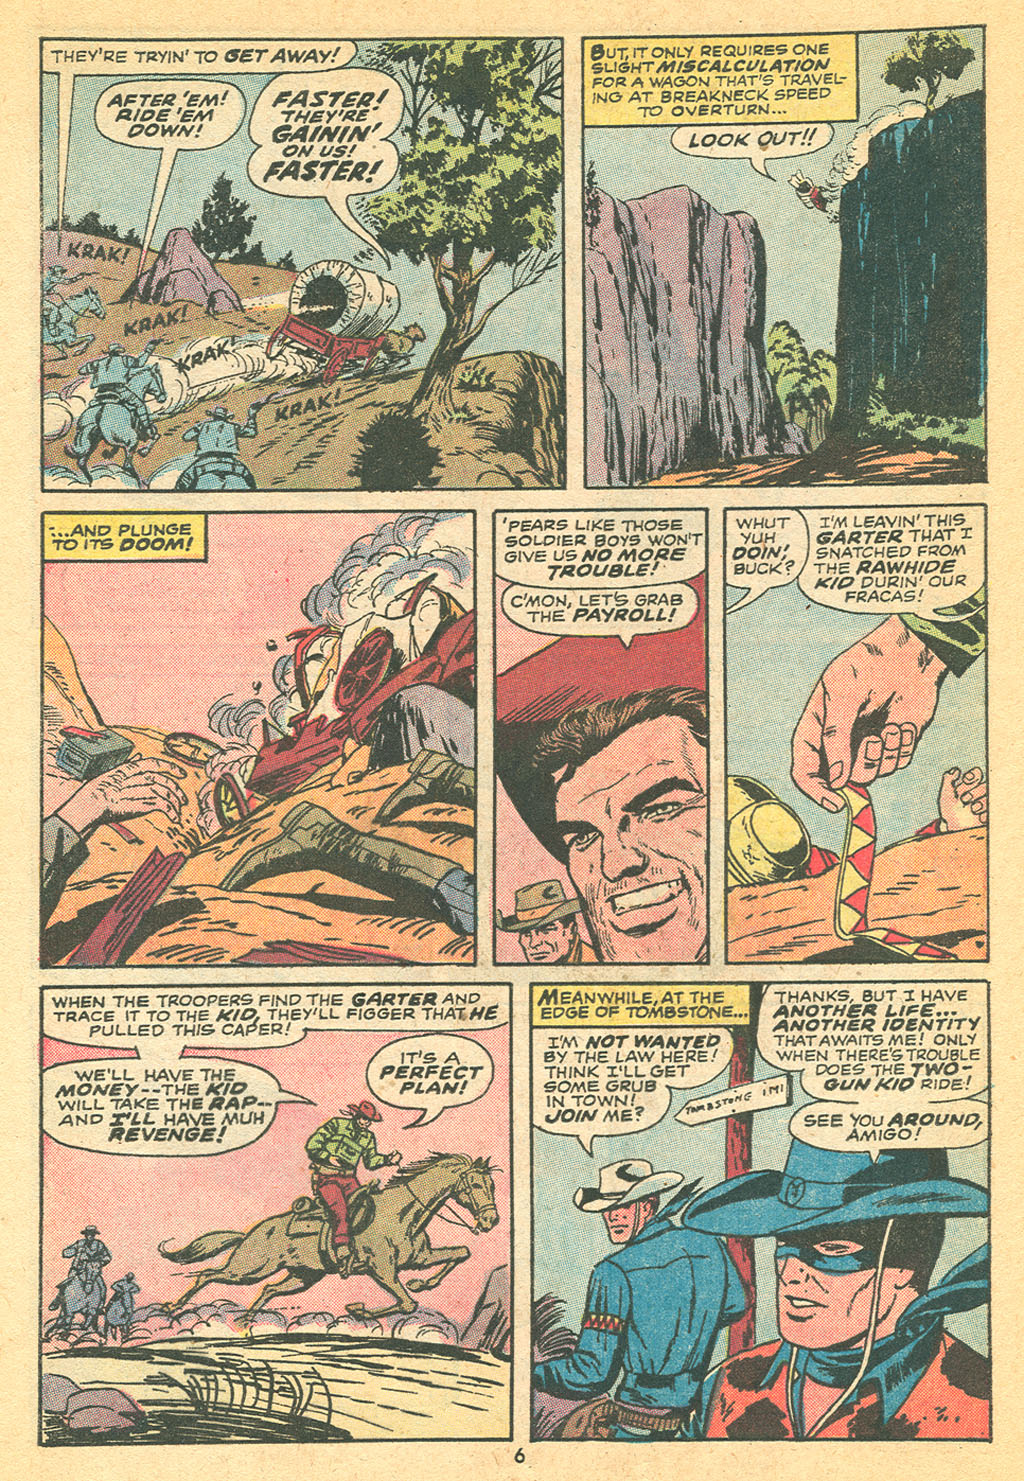 Read online Two-Gun Kid comic -  Issue #108 - 8